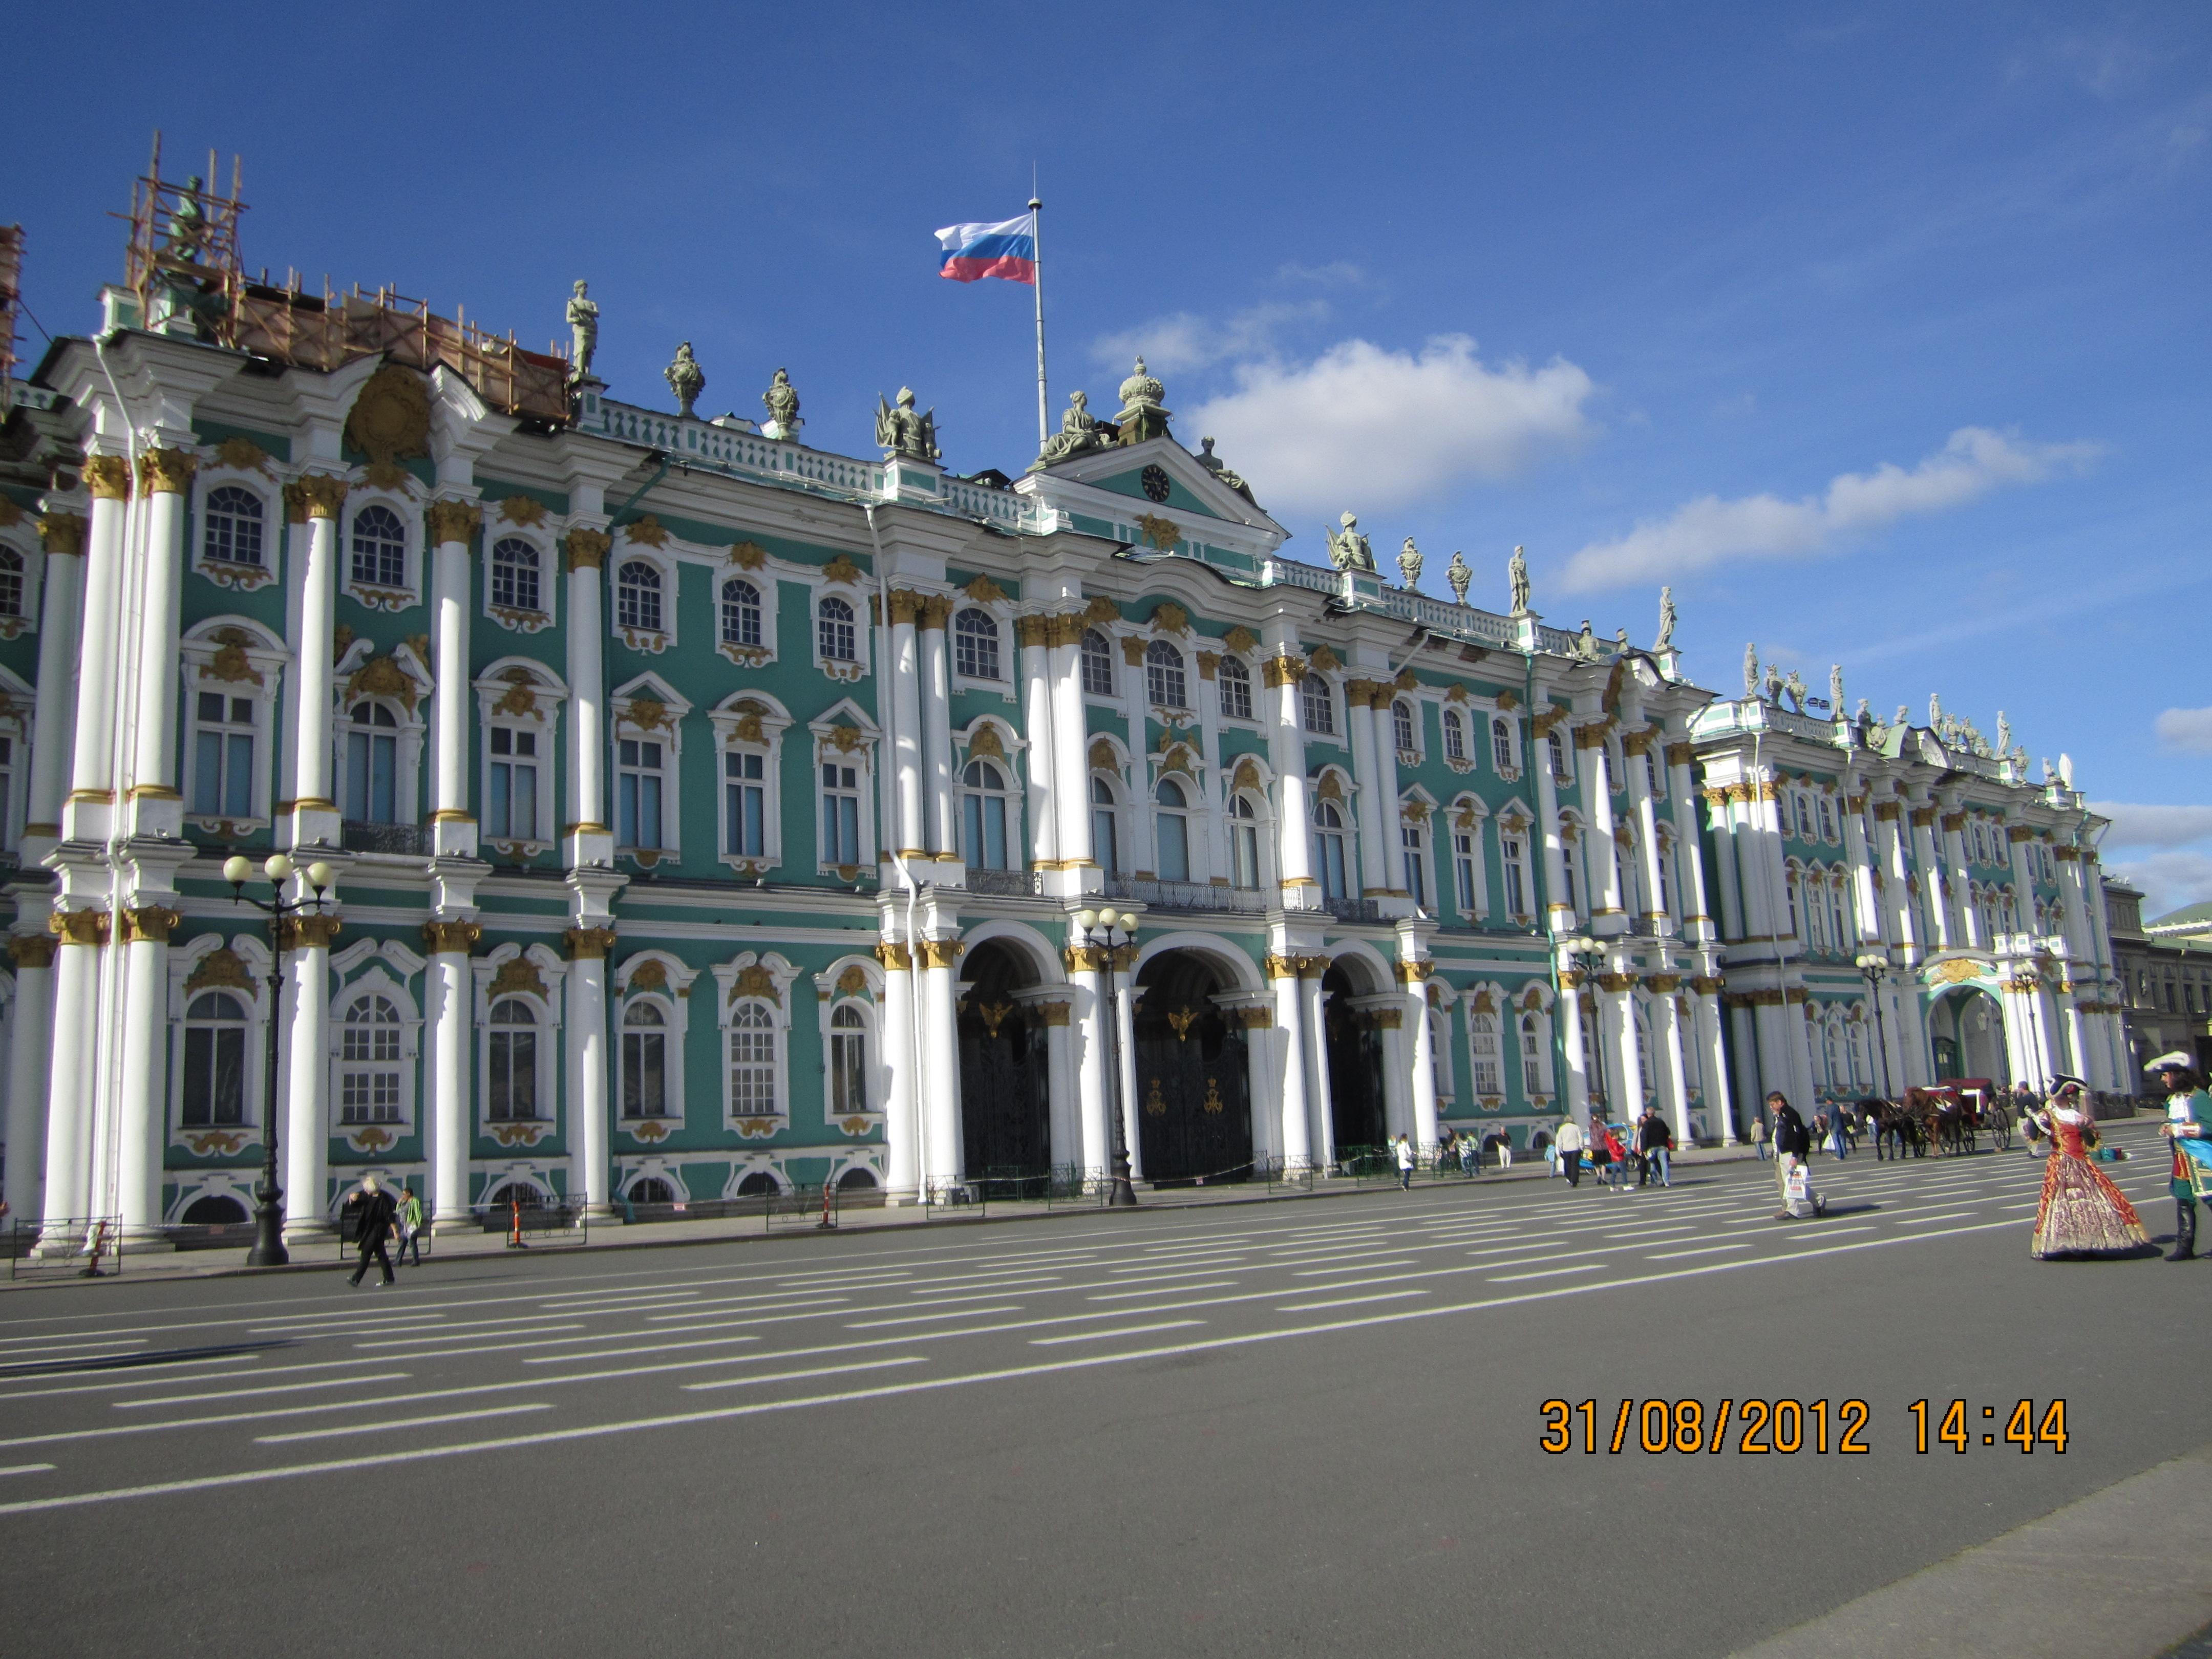 Fichier Mus 233 E De L Ermitage St Petersbourg Jpg Wikip 233 Dia